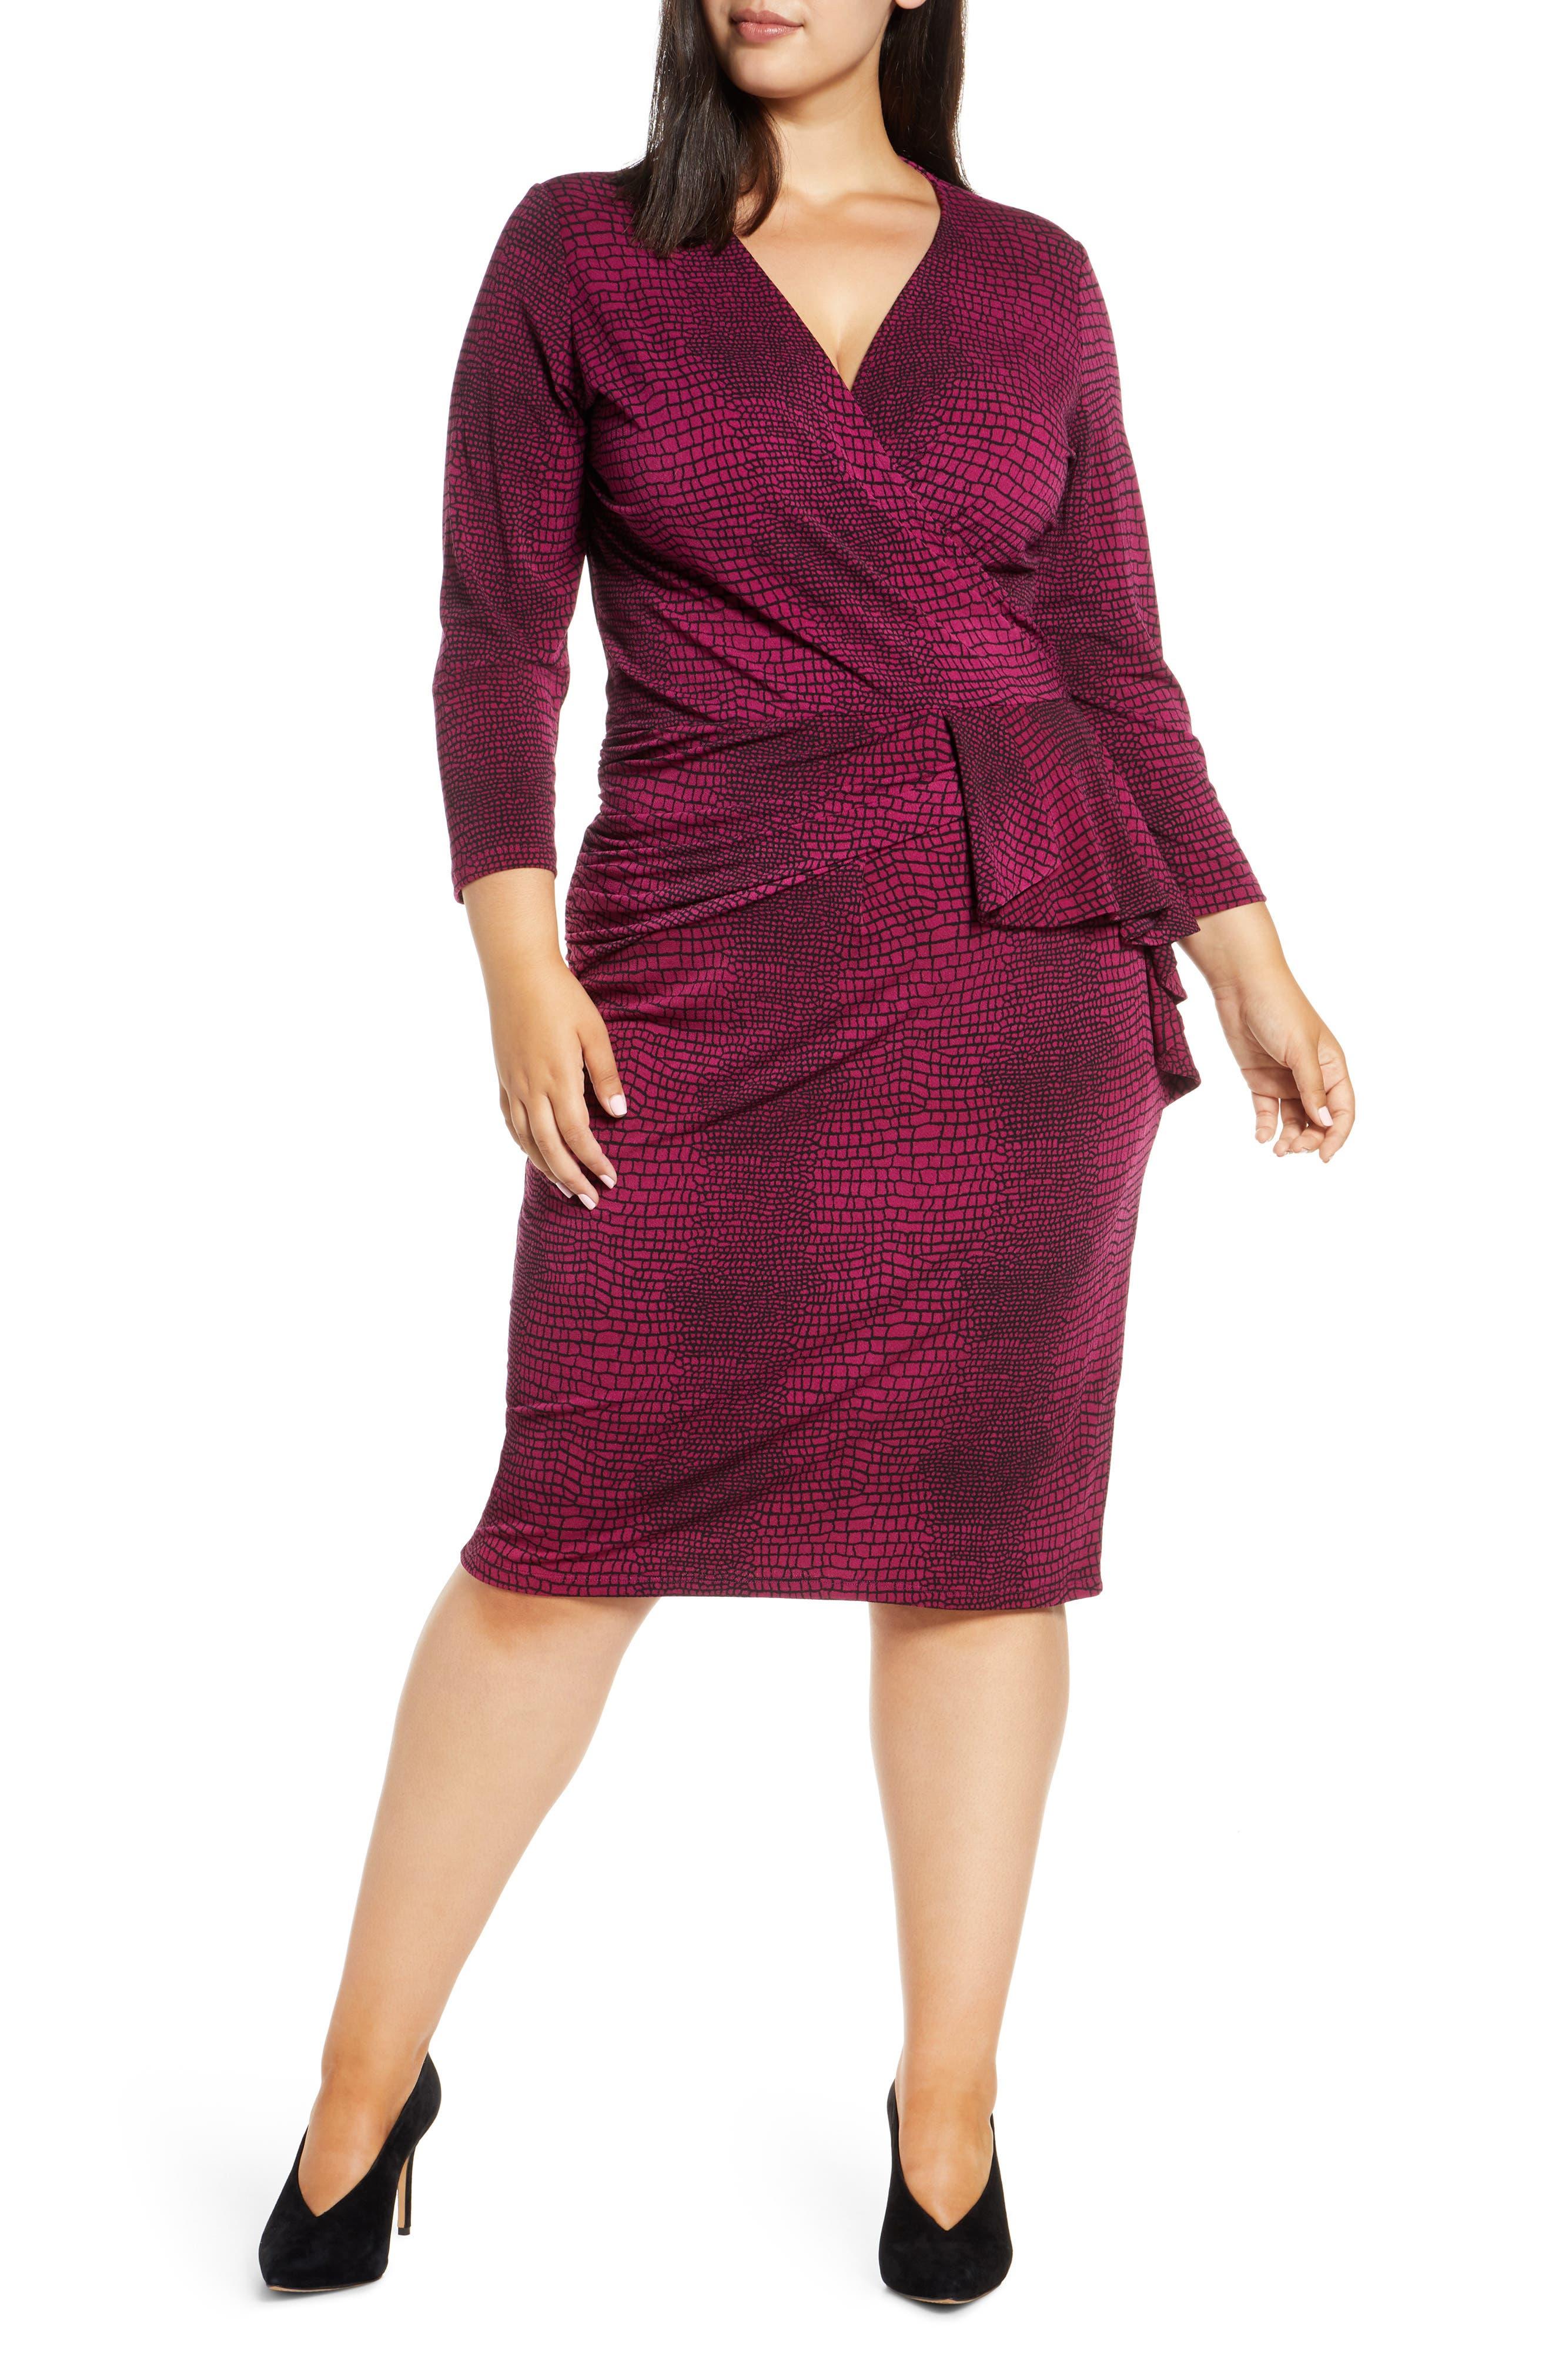 Image of Leota Scarlett Ruffled Wrap Midi Dress